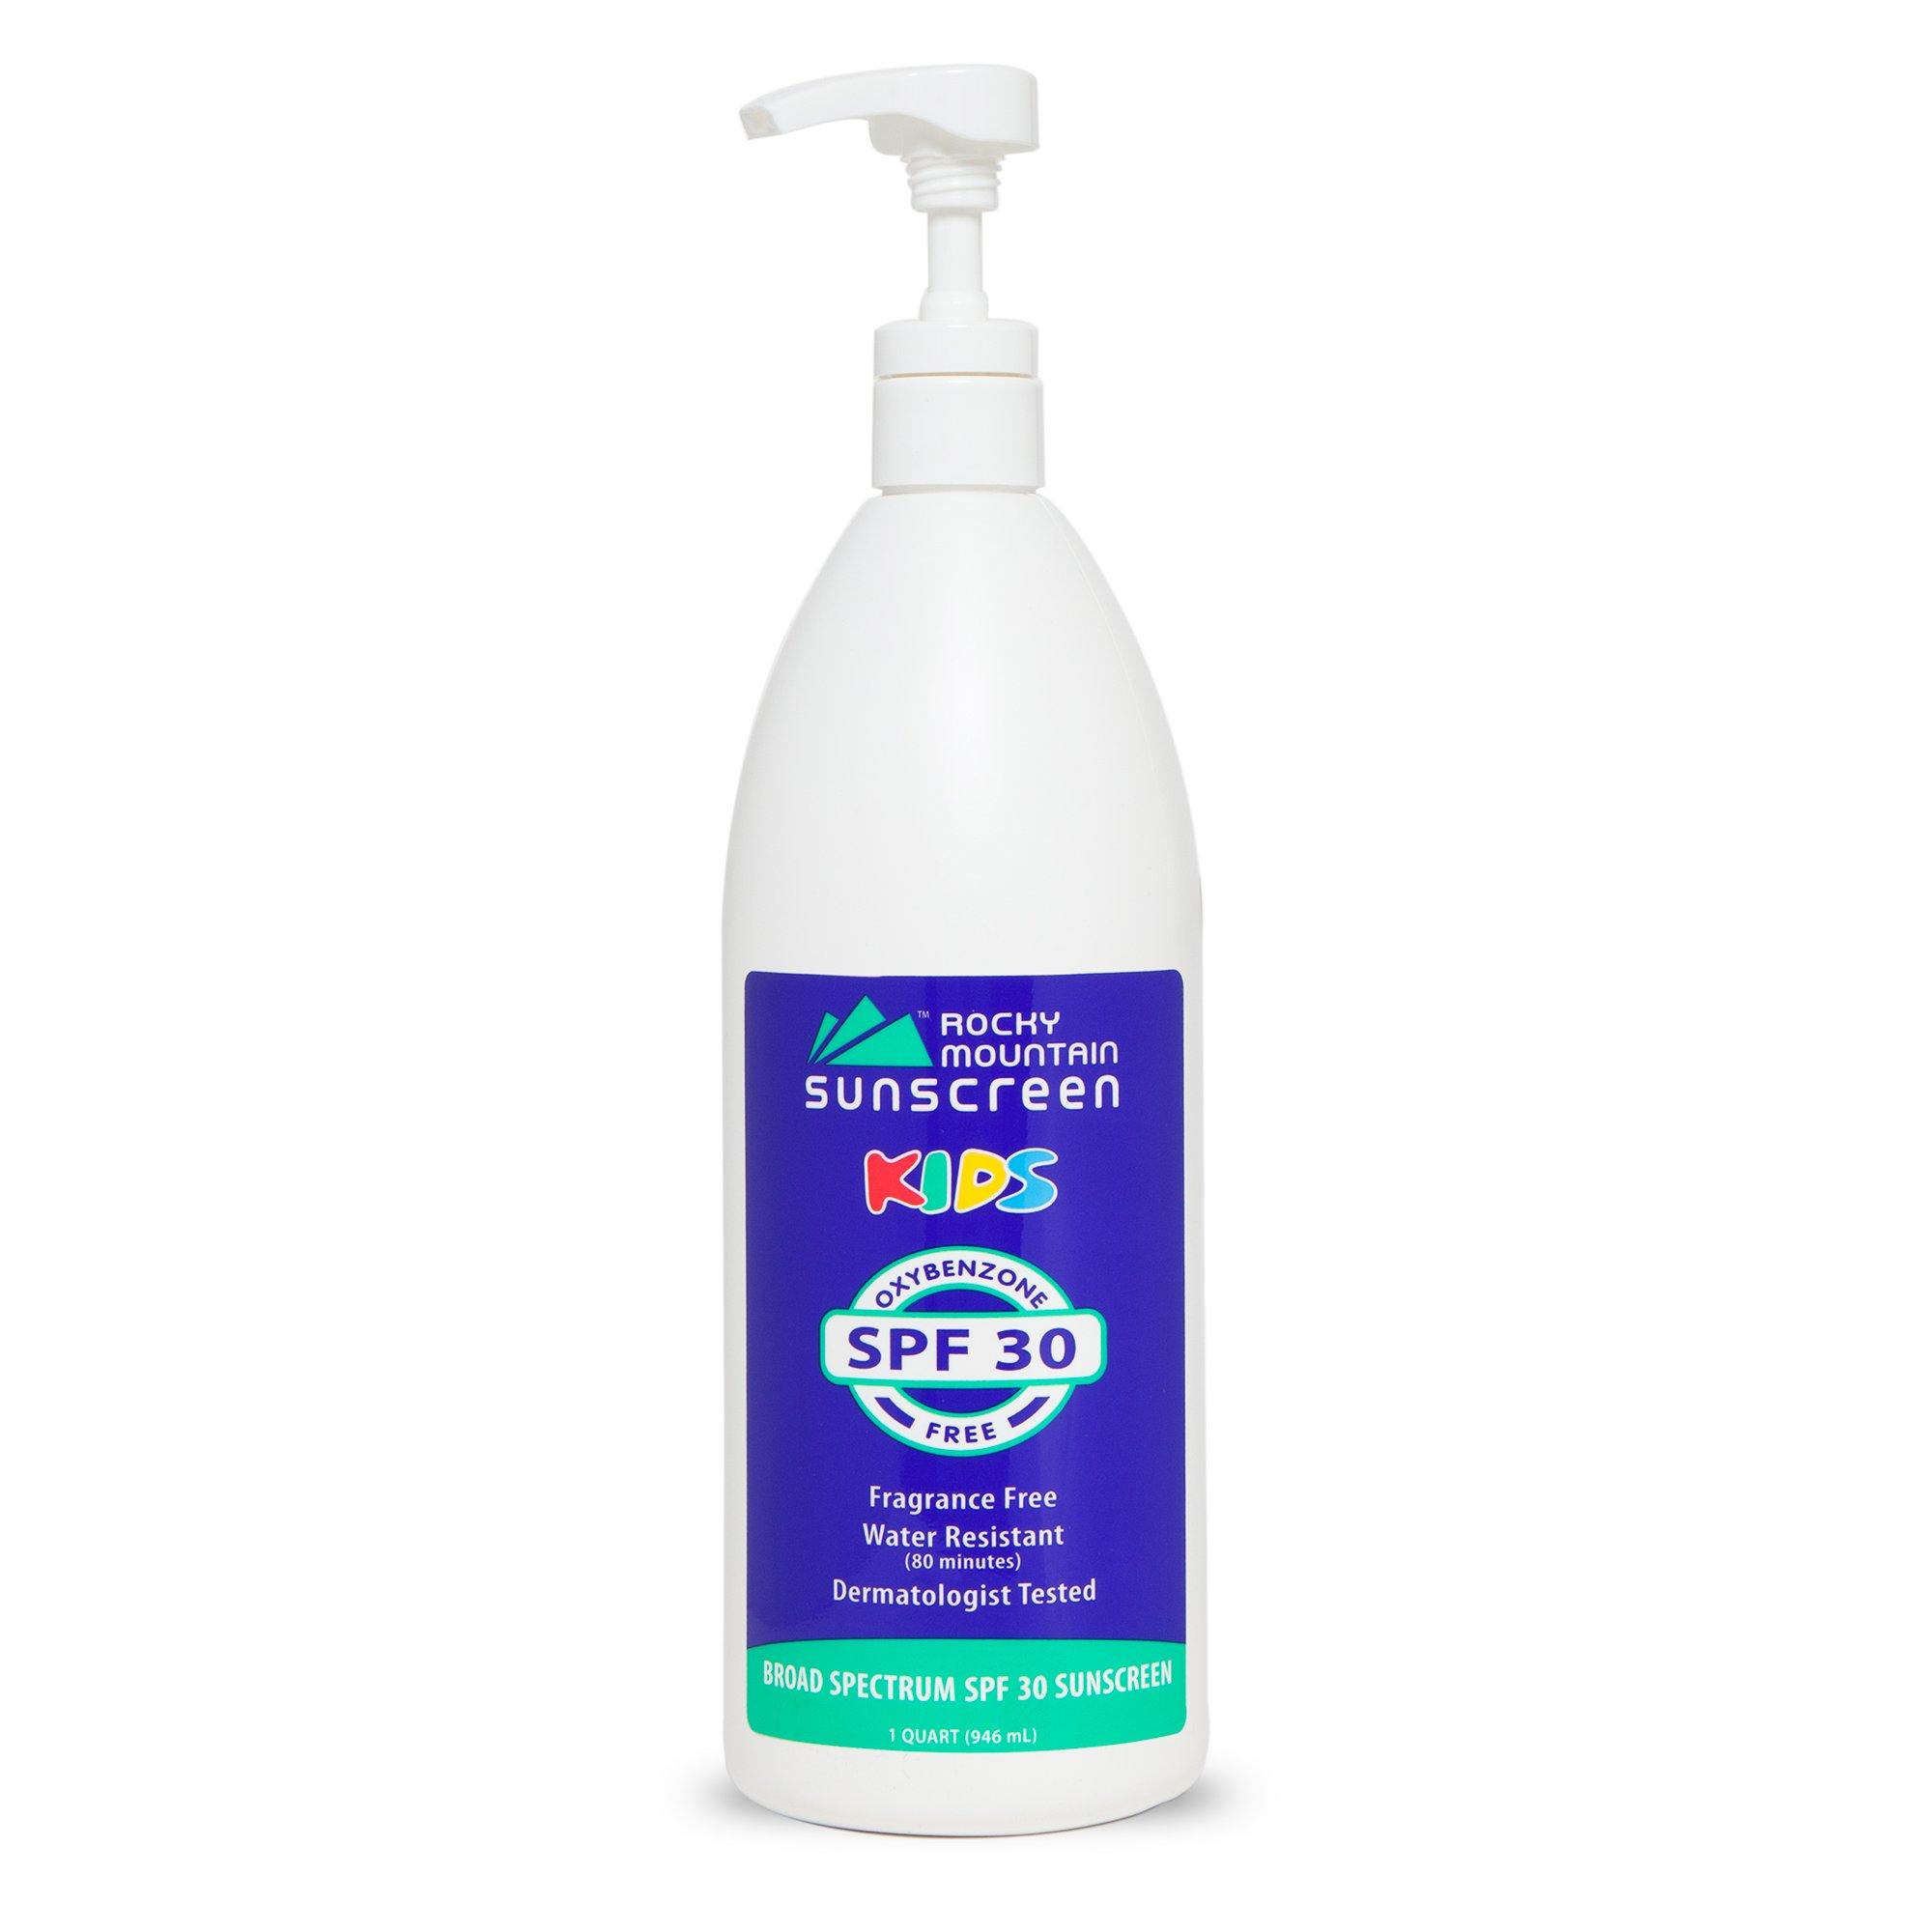 Rocky Mountain Sunscreen - Kids, Quart, SPF 30 - Oxybenzone Free